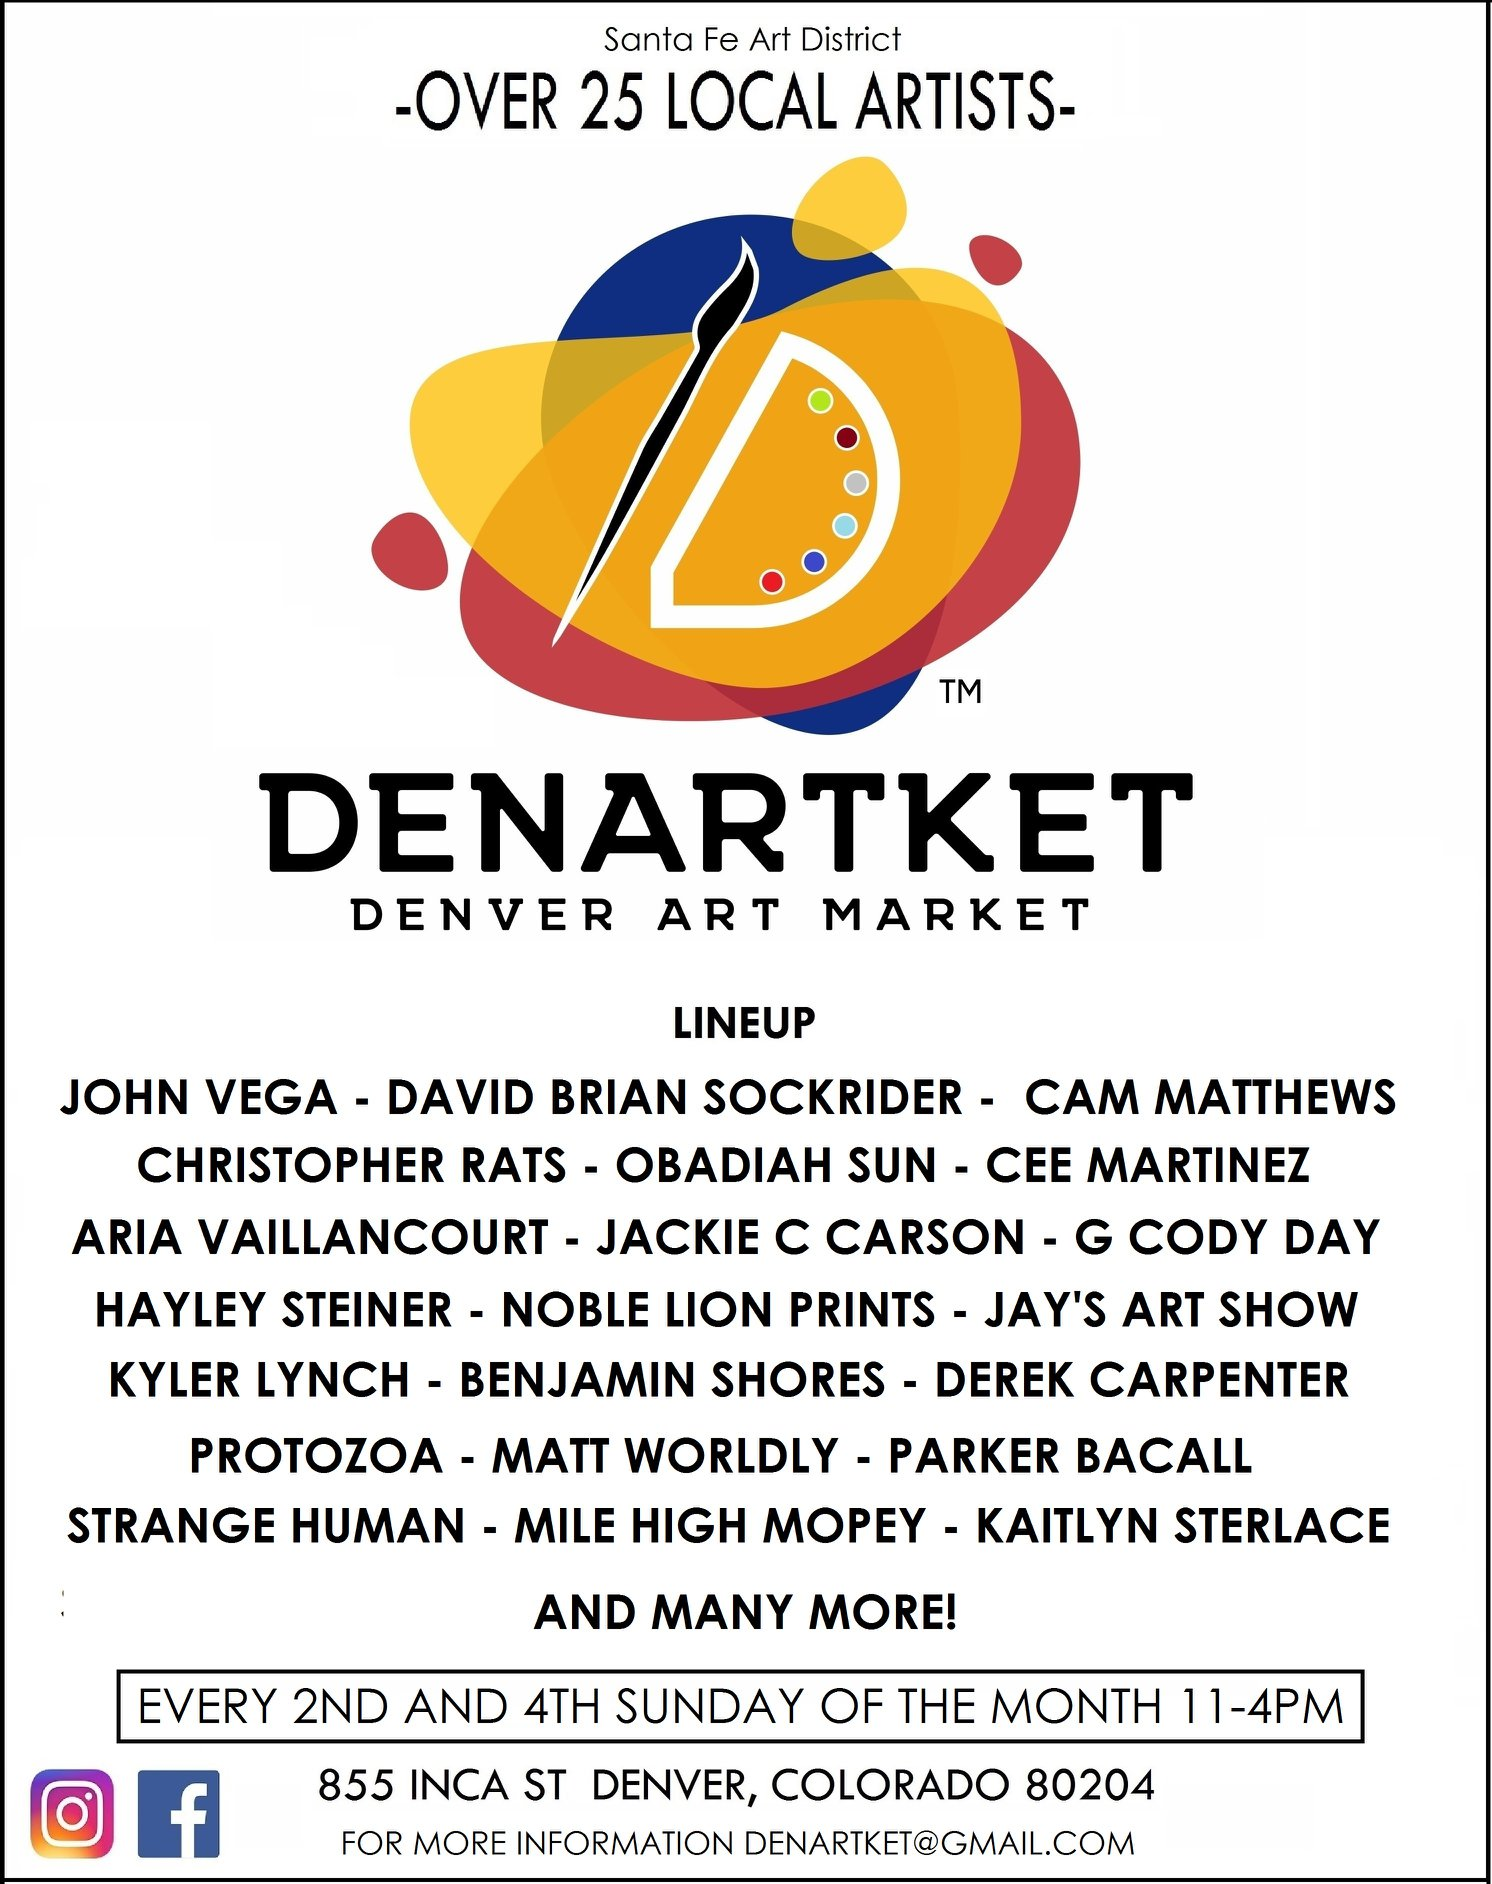 DenArtKet art and lineup